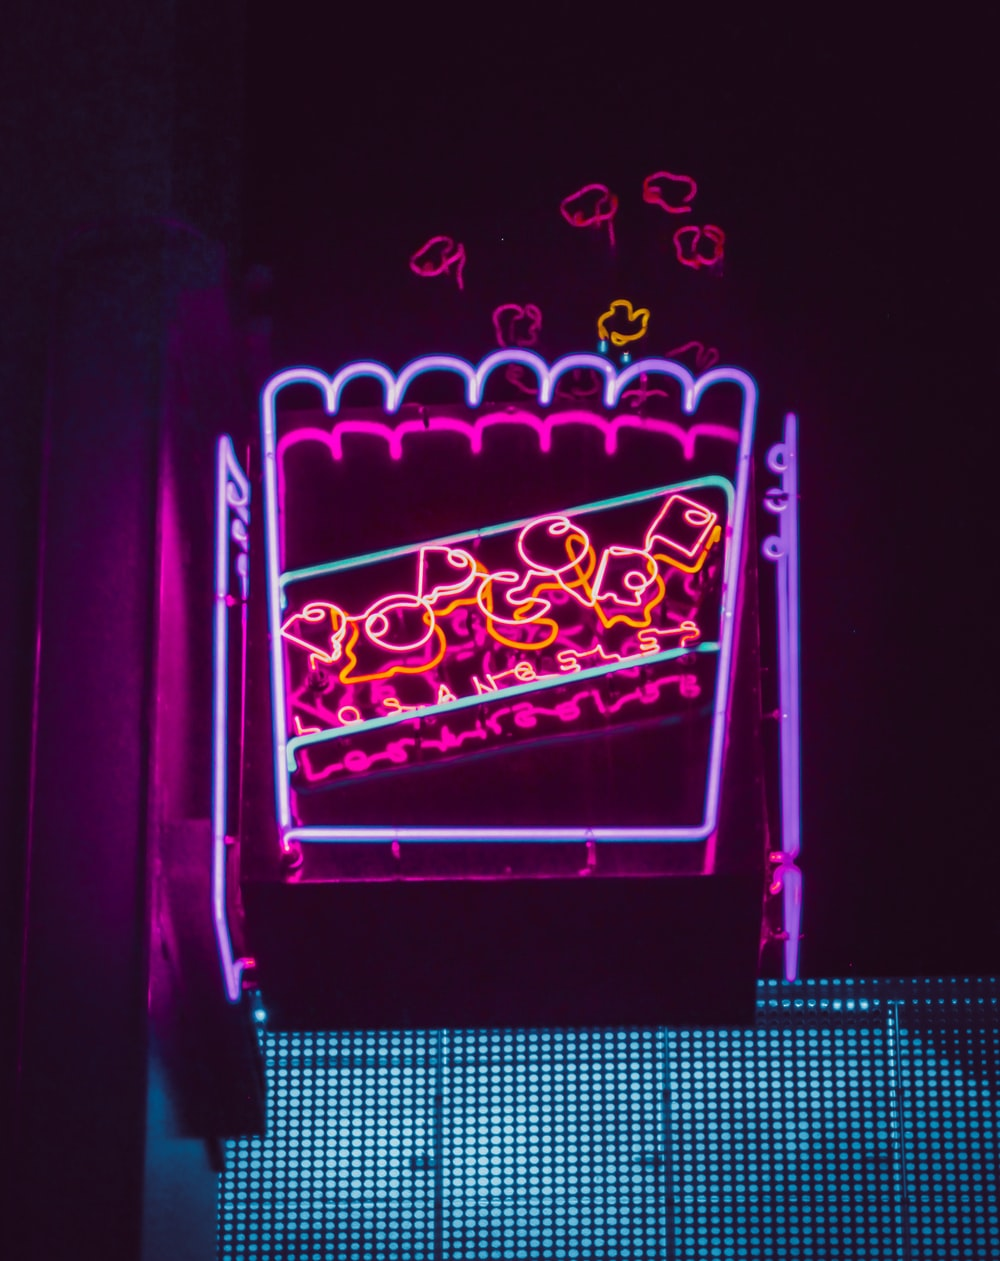 neon signage at night